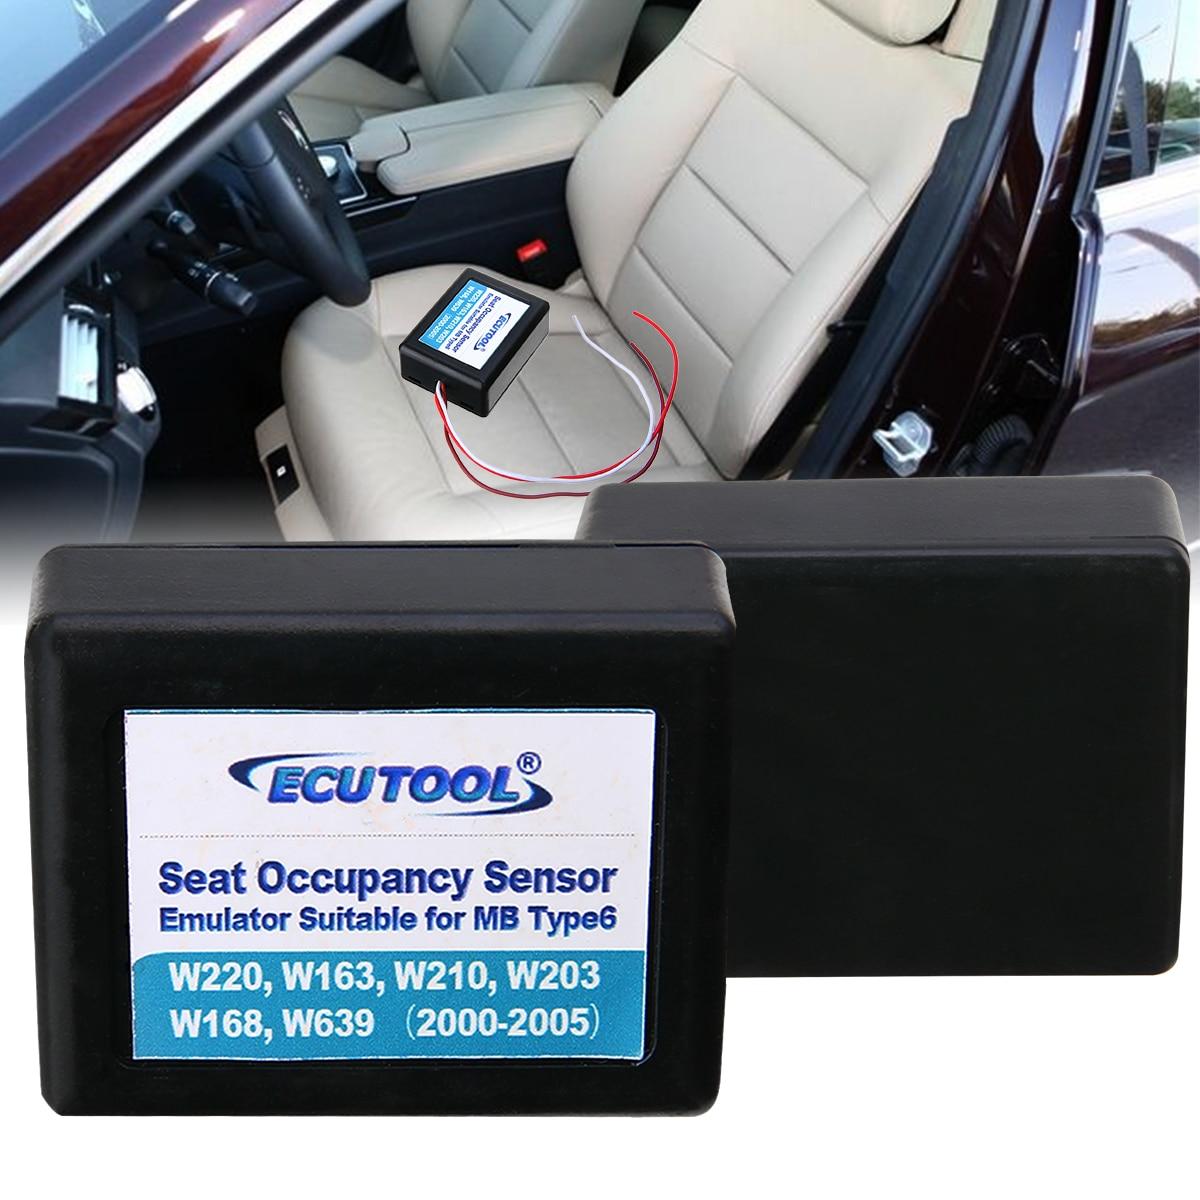 For MERCEDES S W220 1998-2002 Airbag Emulator-Passanger Occupancy Seat Sensor